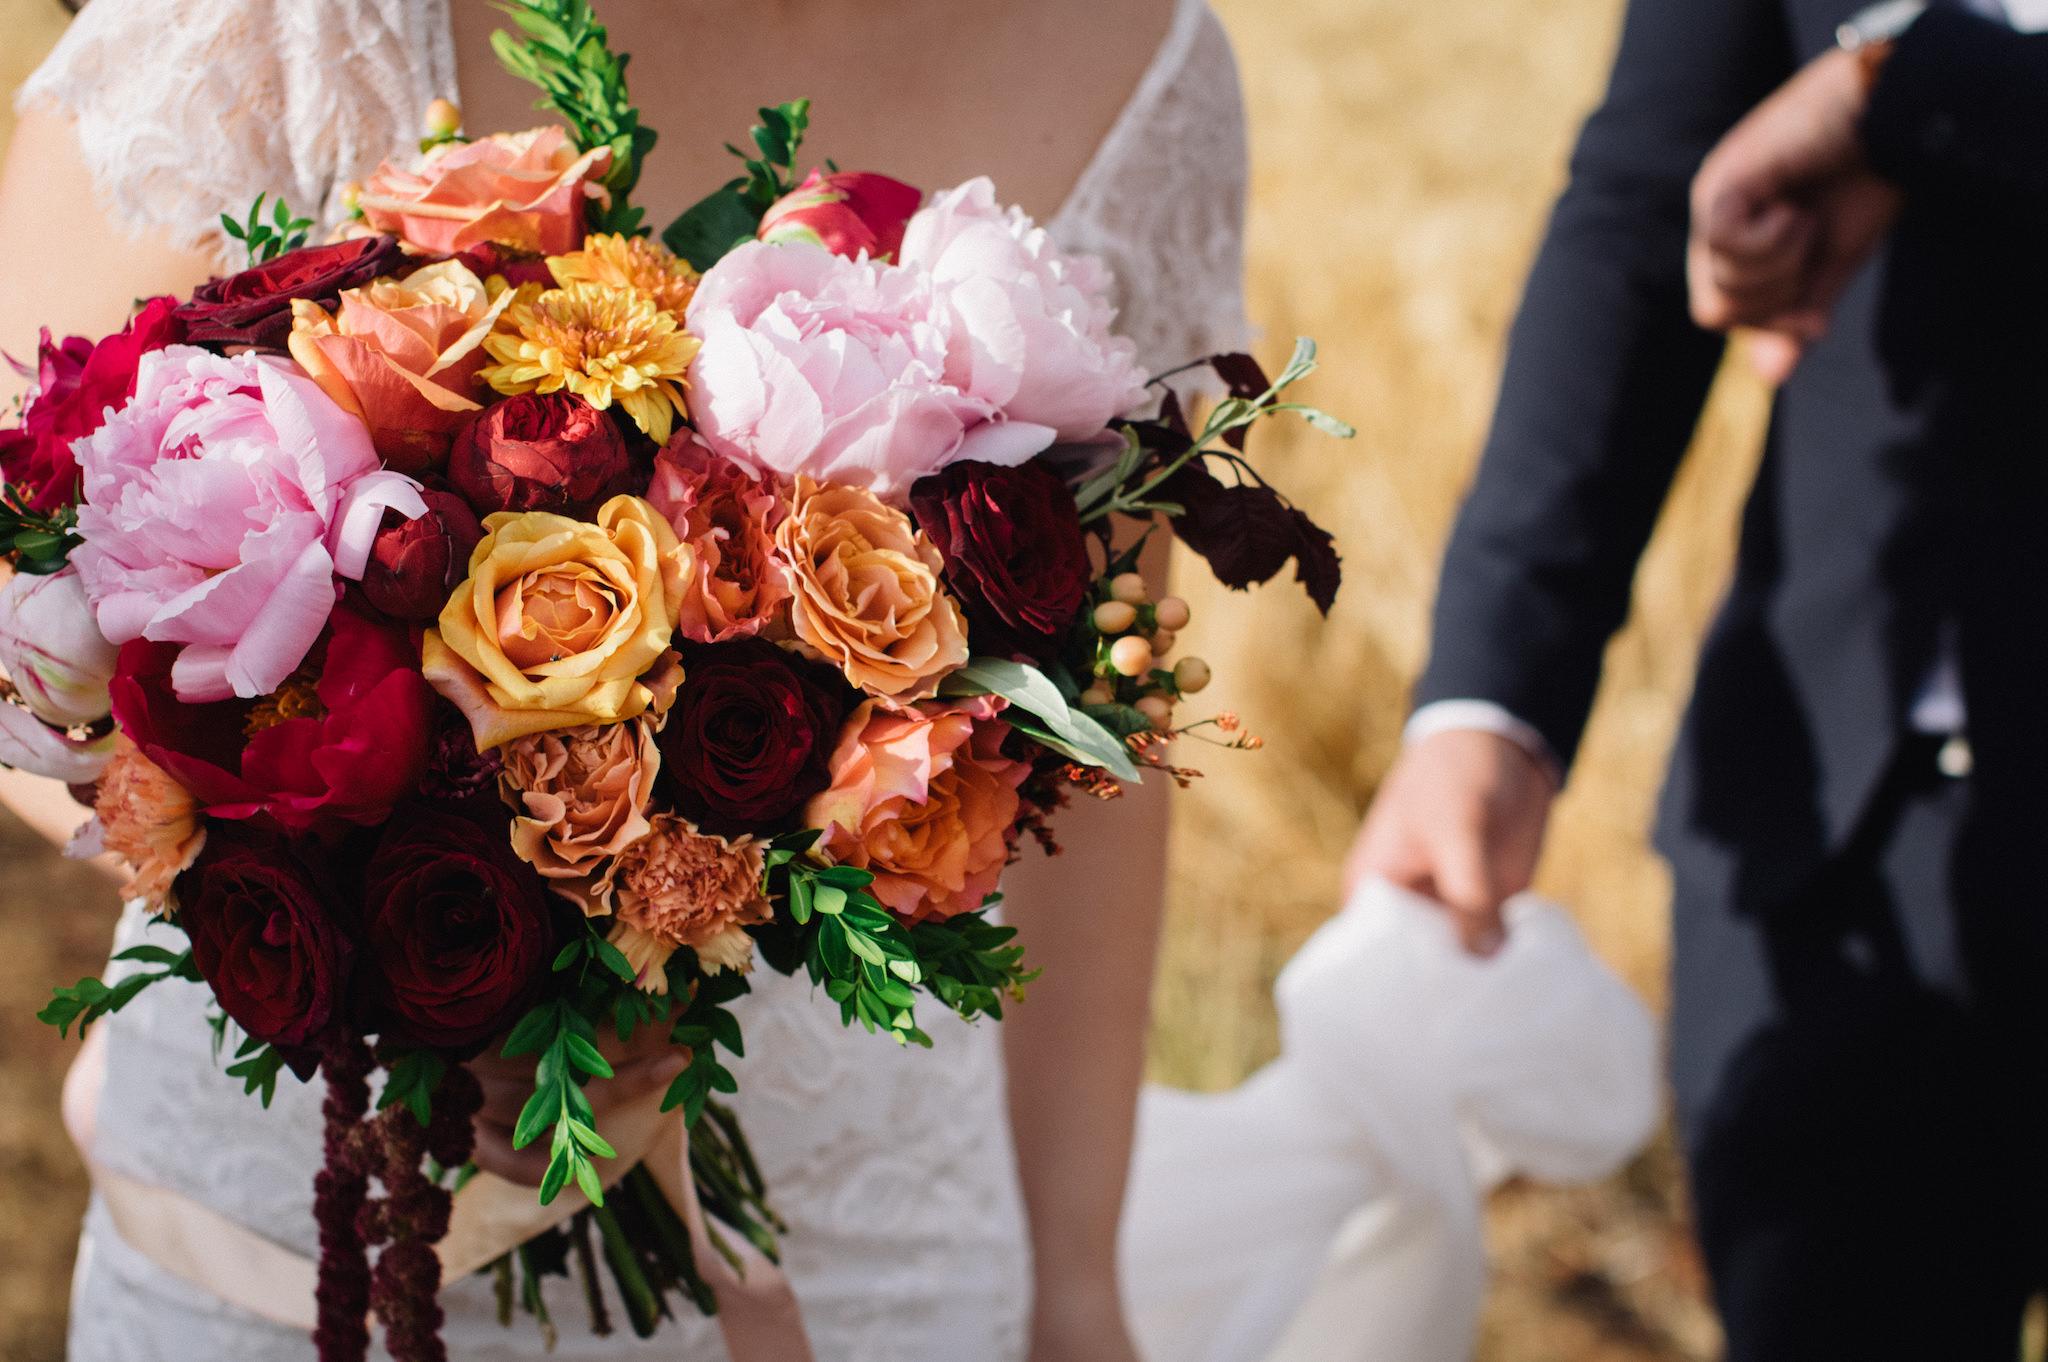 Avon Valley Wheat Field Sarah Marvin York Wedding Photographer 5